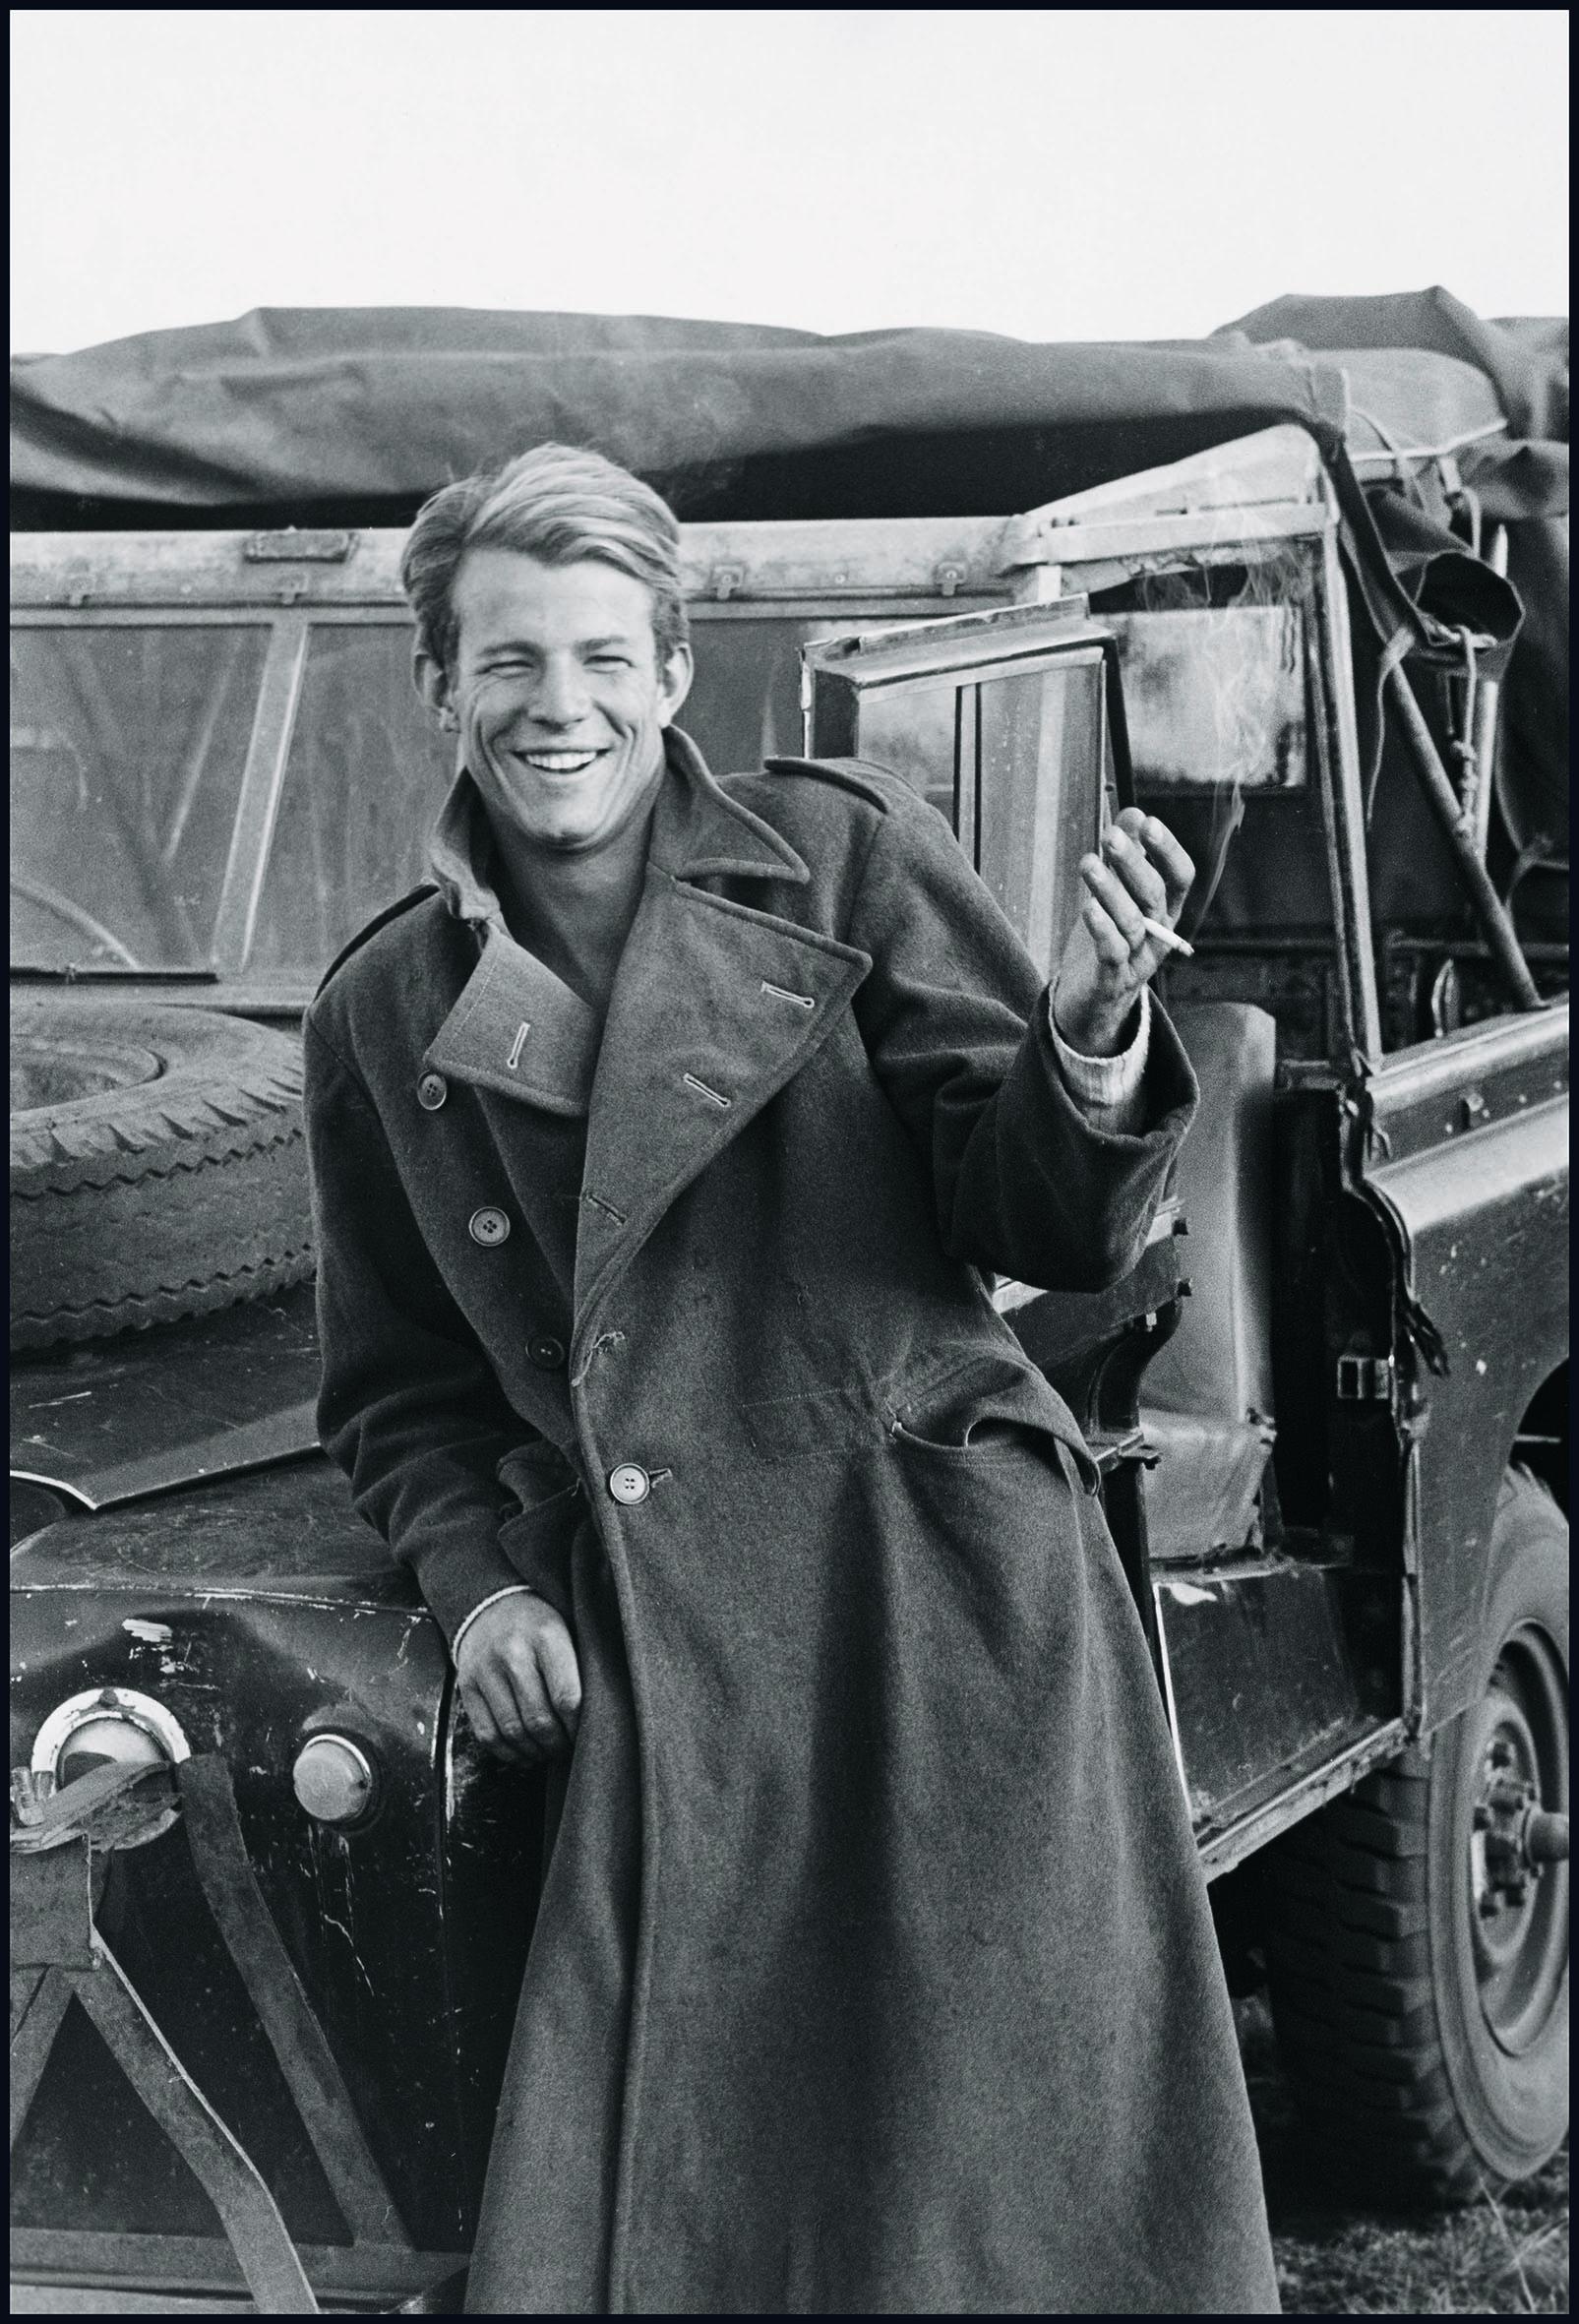 Peter Beard, Aberdare Moorlands, Kenya, 1966